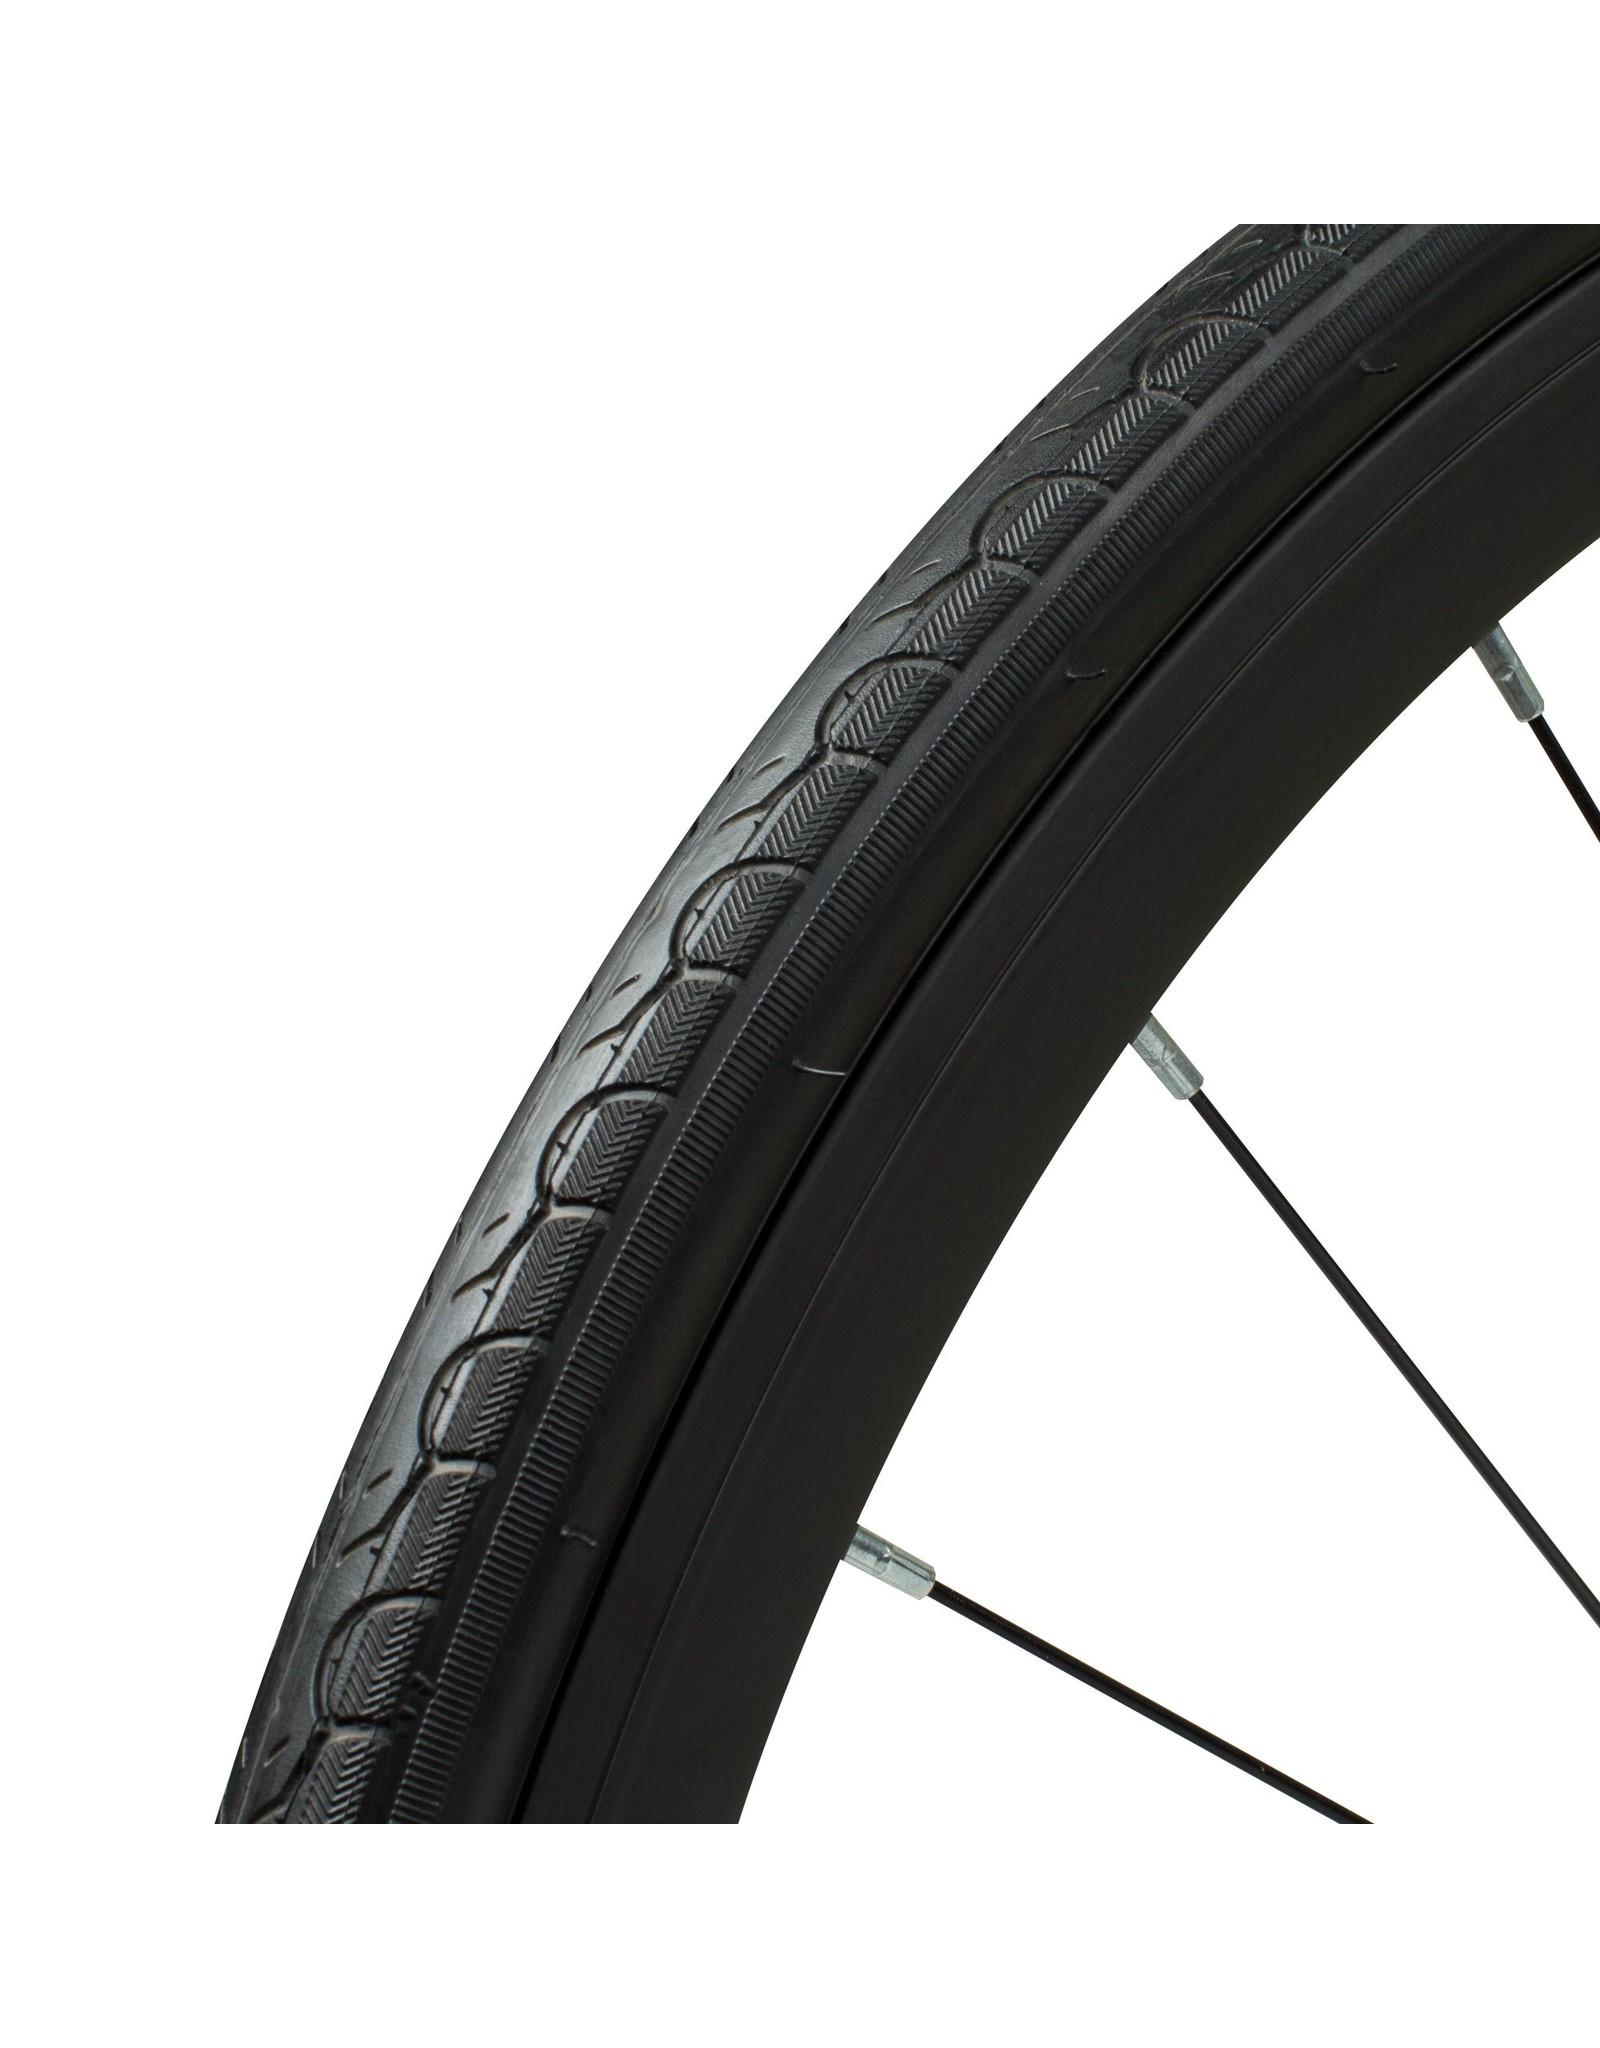 2018 6KU Fixie & Single Speed Bike - Milan 2Size:52cm (30mm rims)